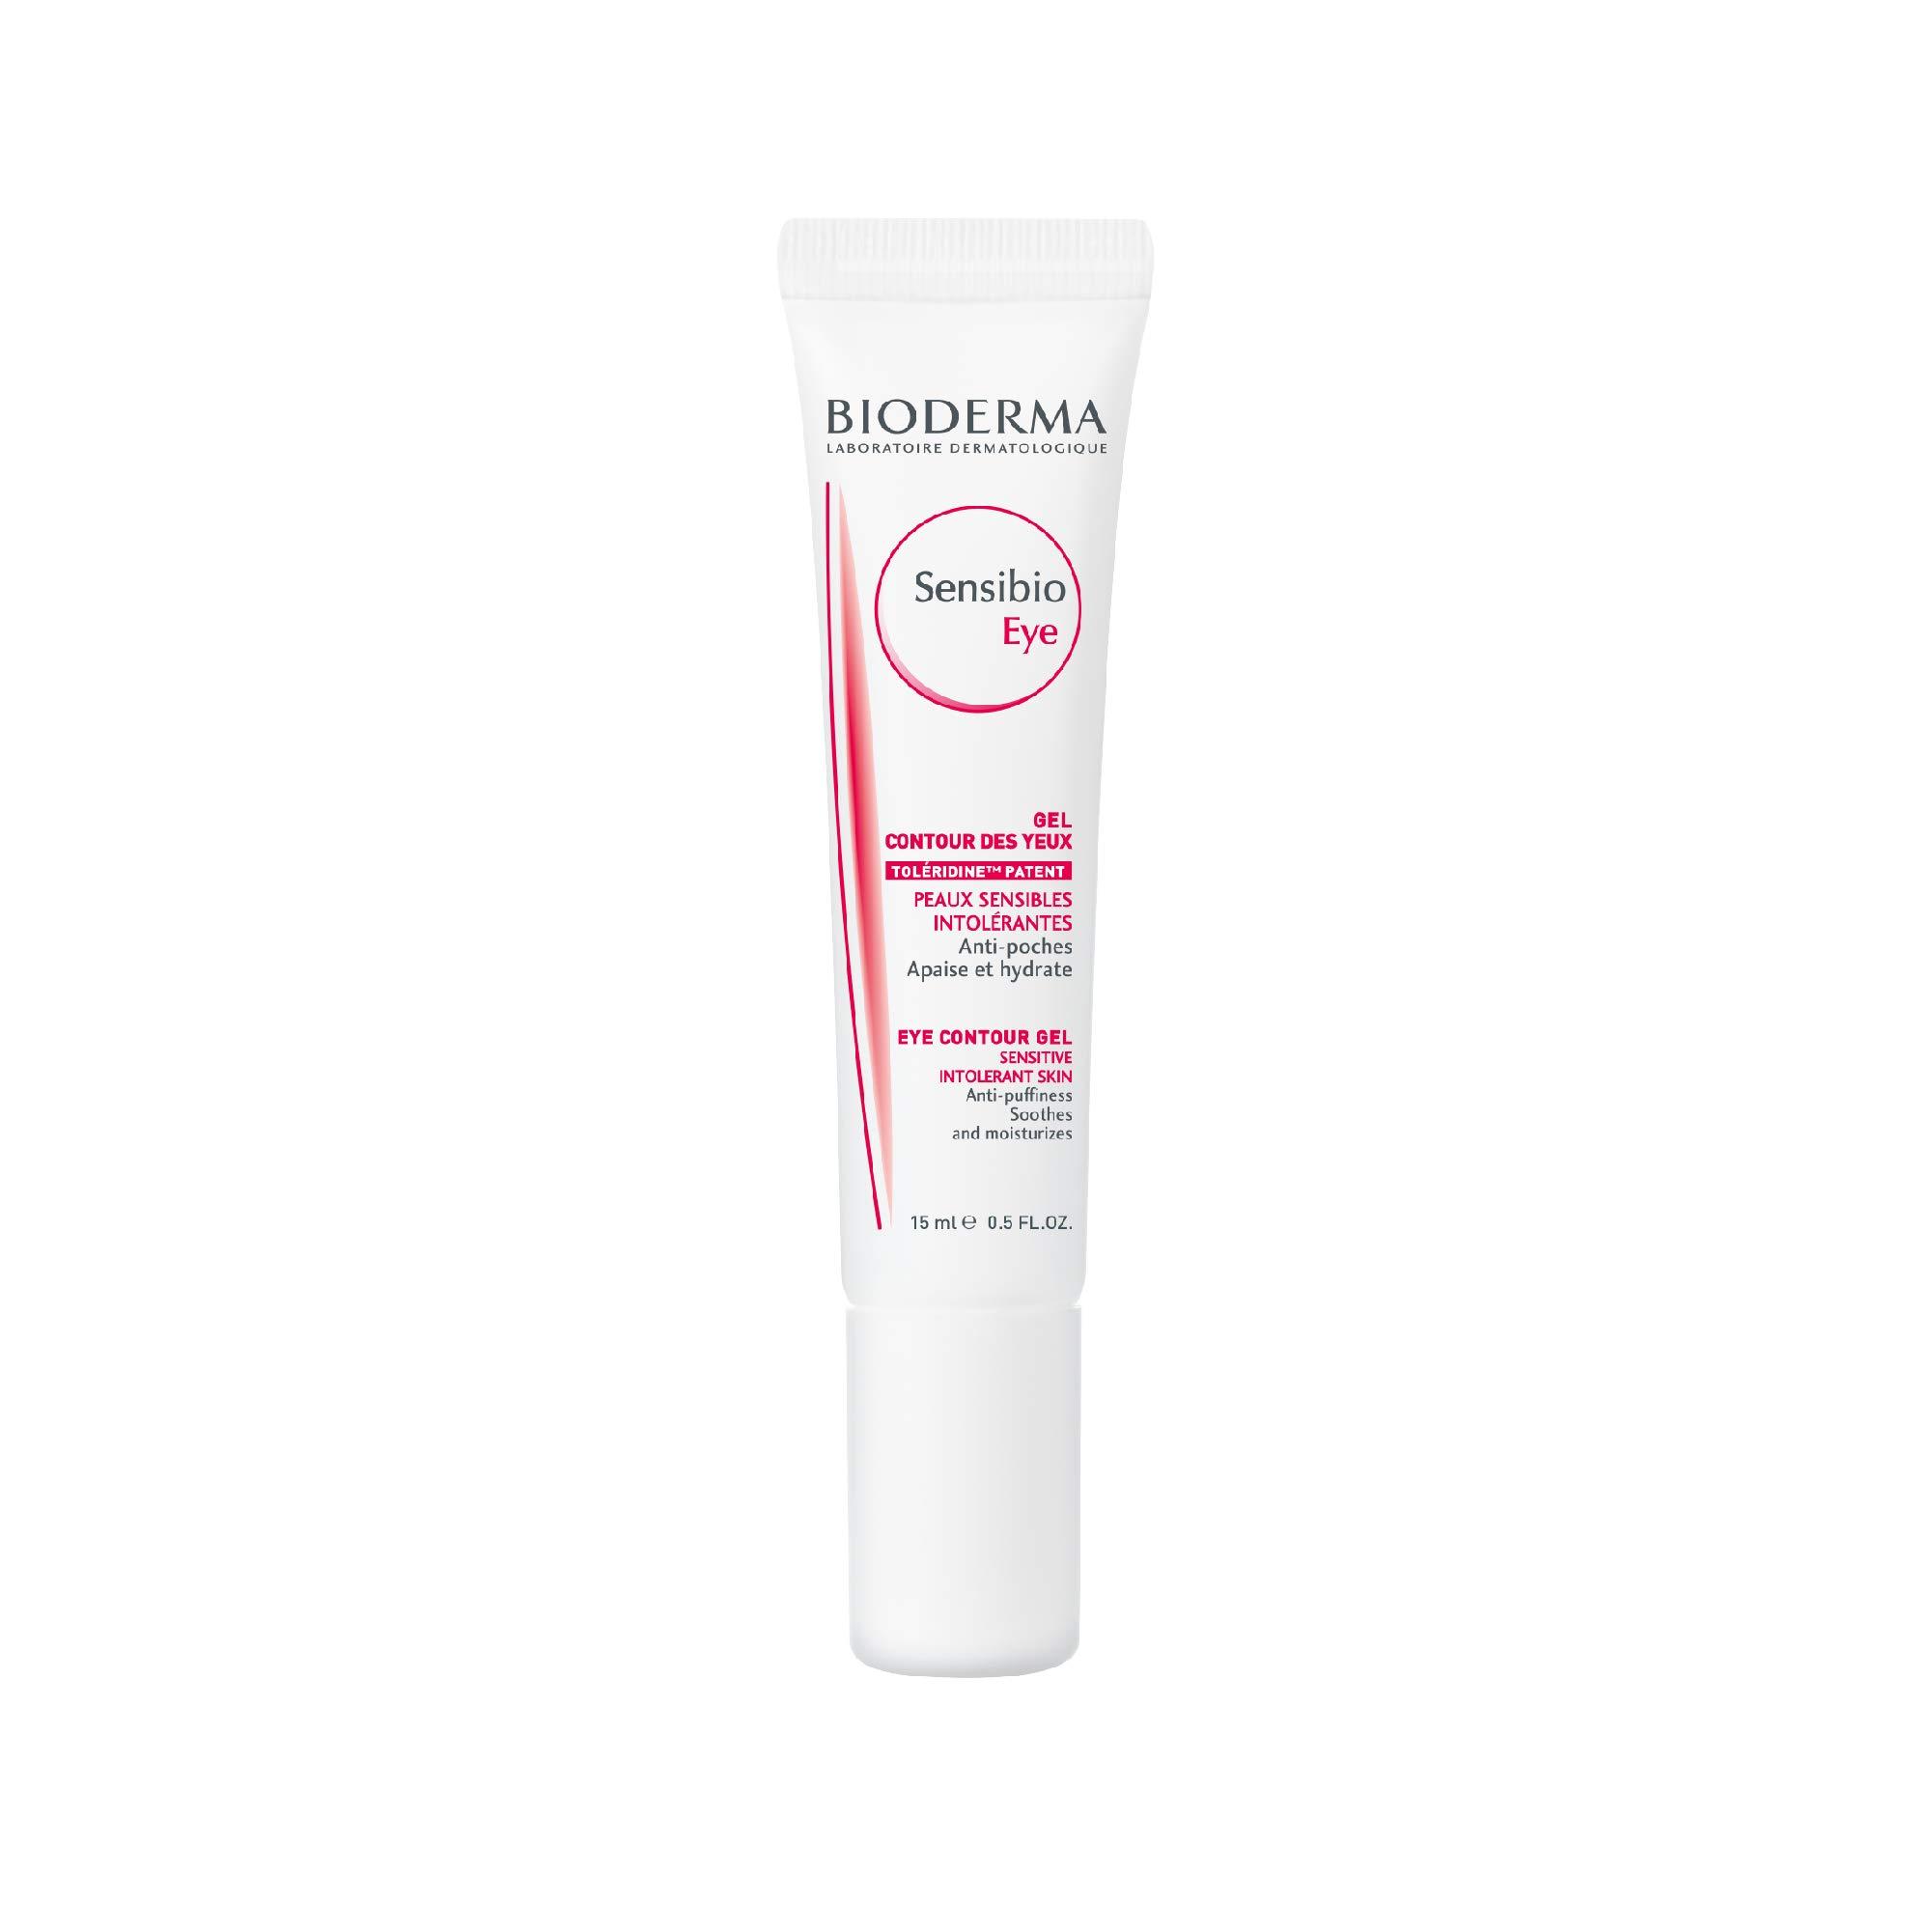 Bioderma - Sensibio - Eye Contour Gel - Moisturizing and visibly reduces fine lines - Skin Soothing - for Sensitive Skin